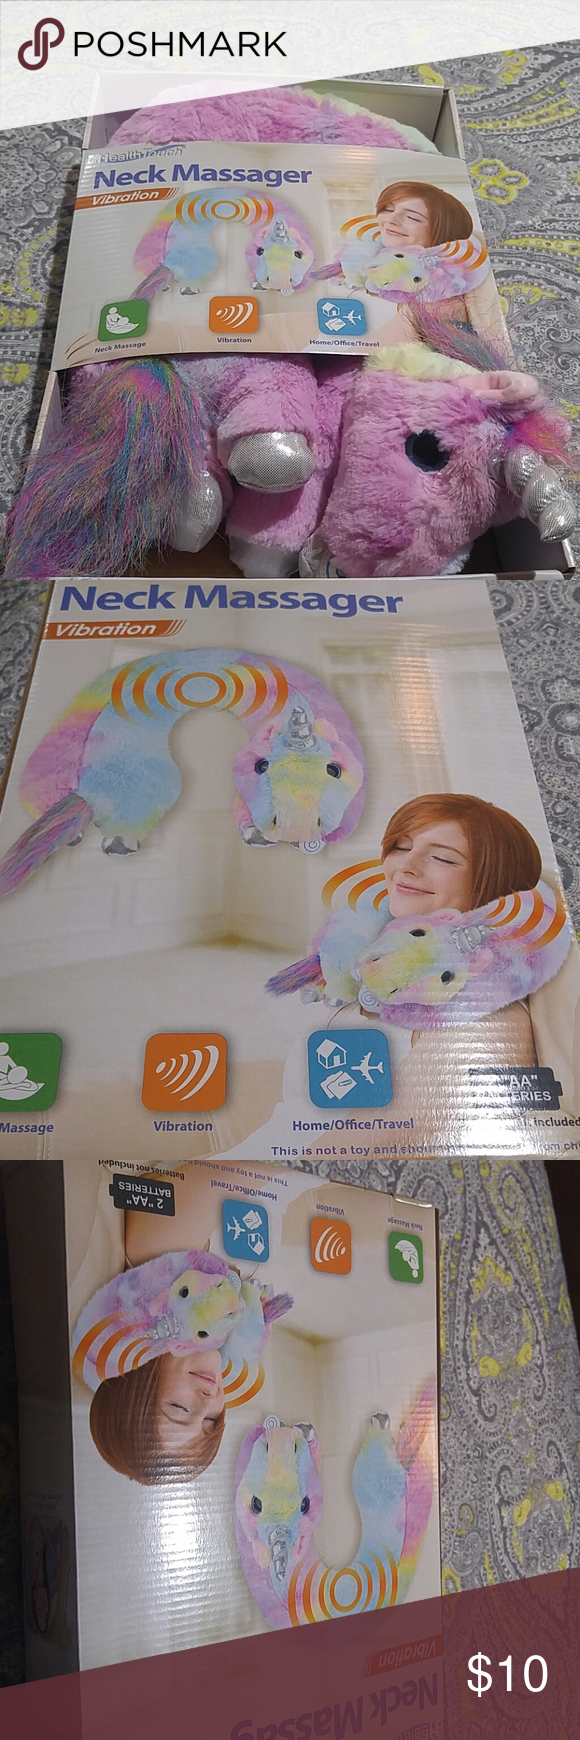 Nice touch massage